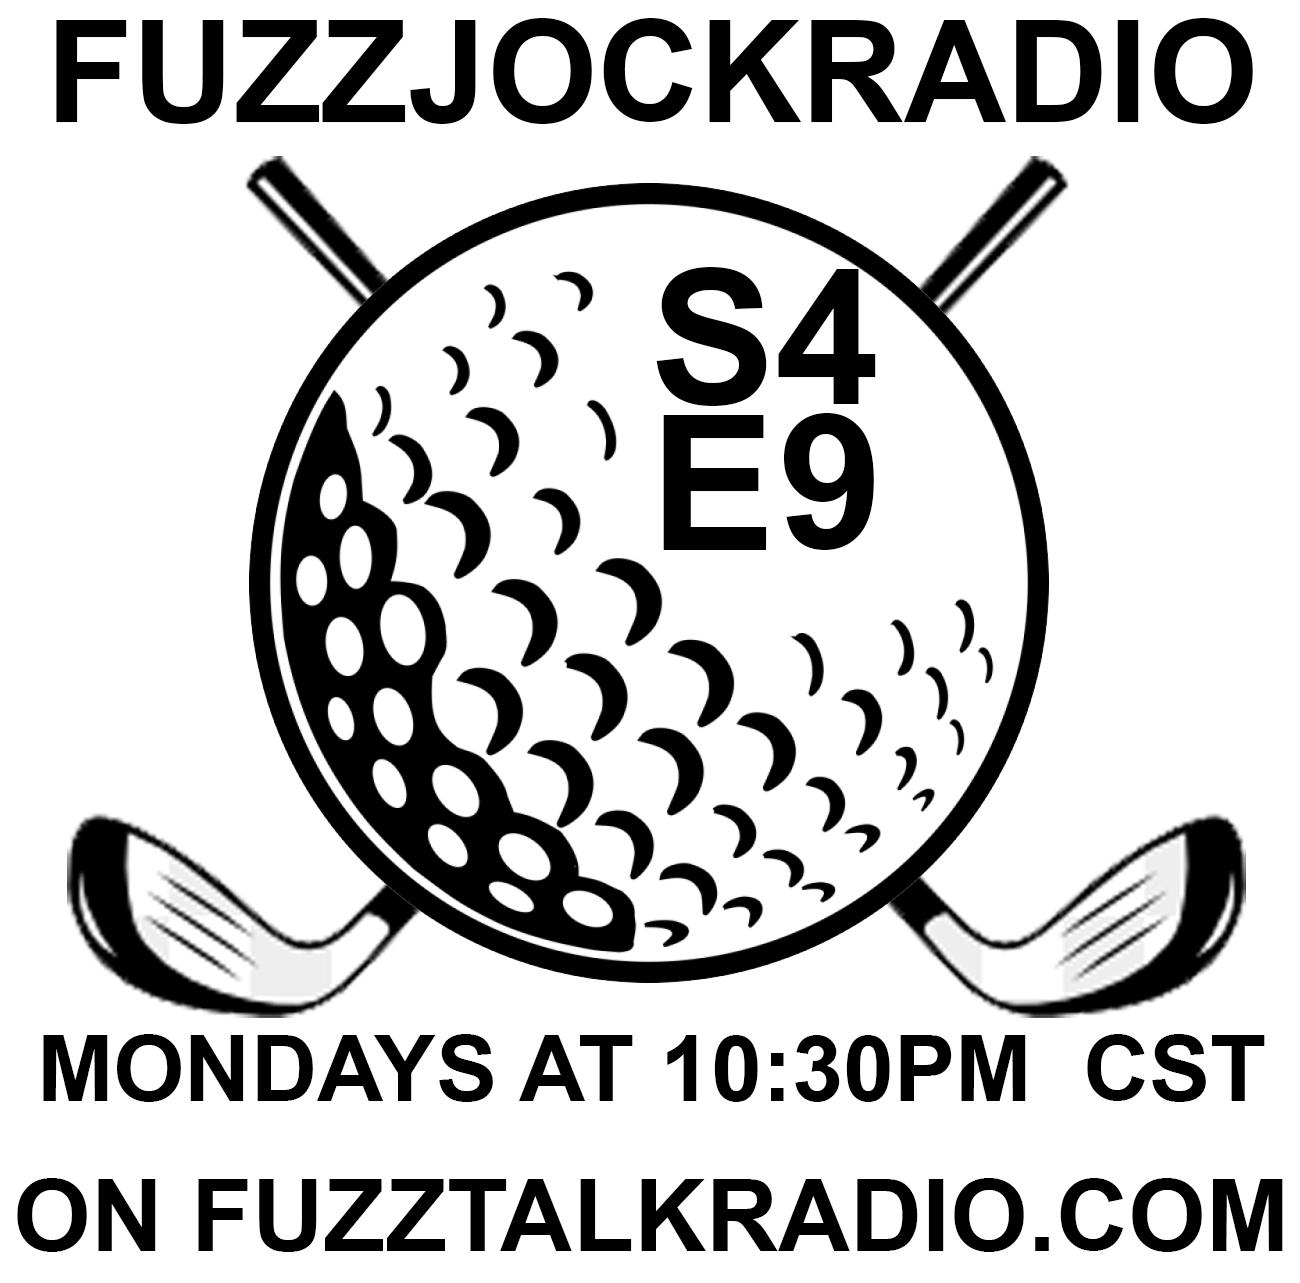 FuzzJockRadio - This Is A Sports Podcast